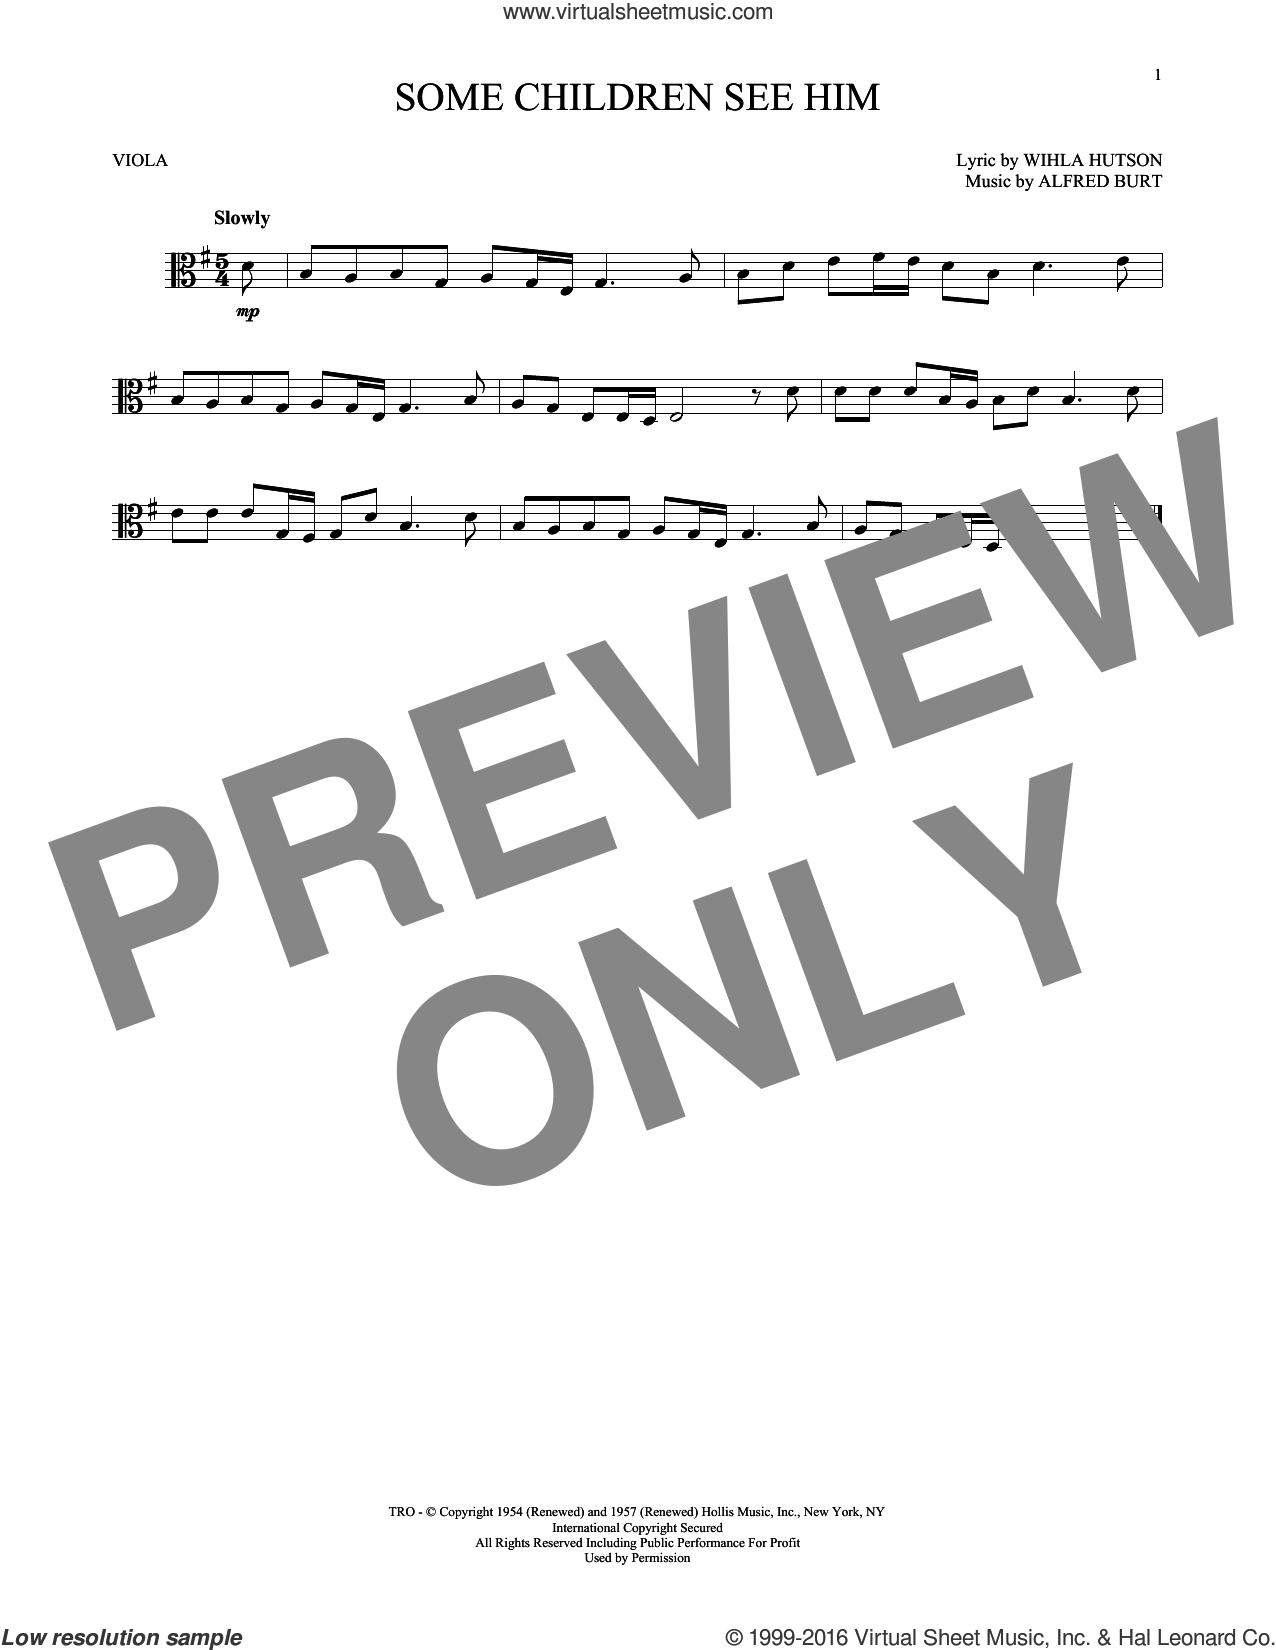 Some Children See Him sheet music for viola solo by Alfred Burt and Wihla Hutson, intermediate skill level